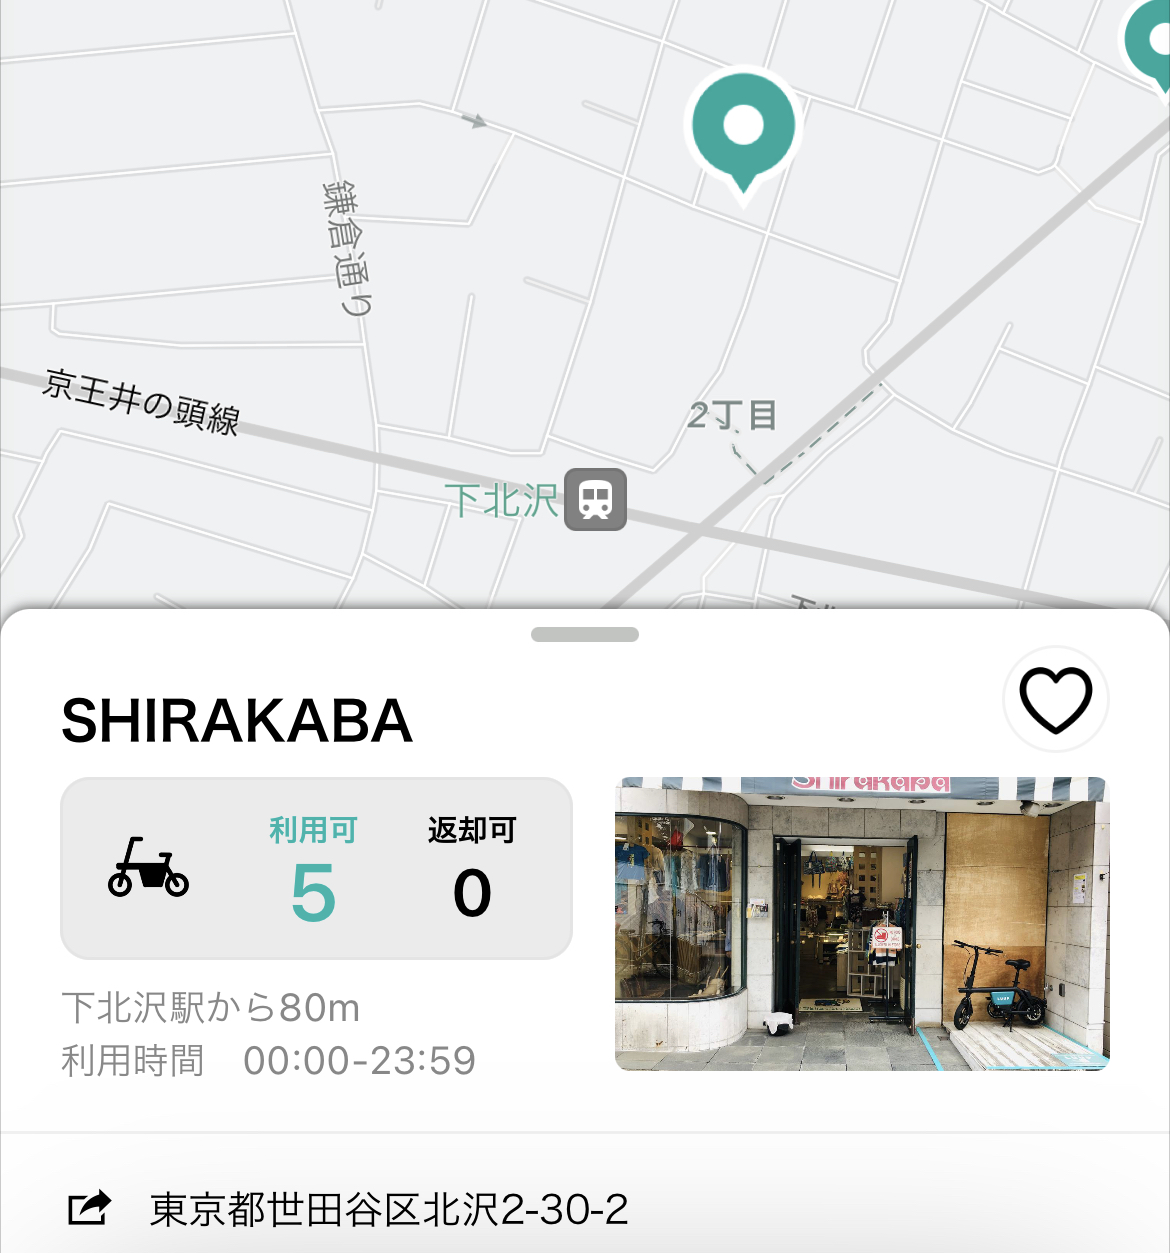 【LUUP電動キックボード】ポート・設置エリア 下北沢